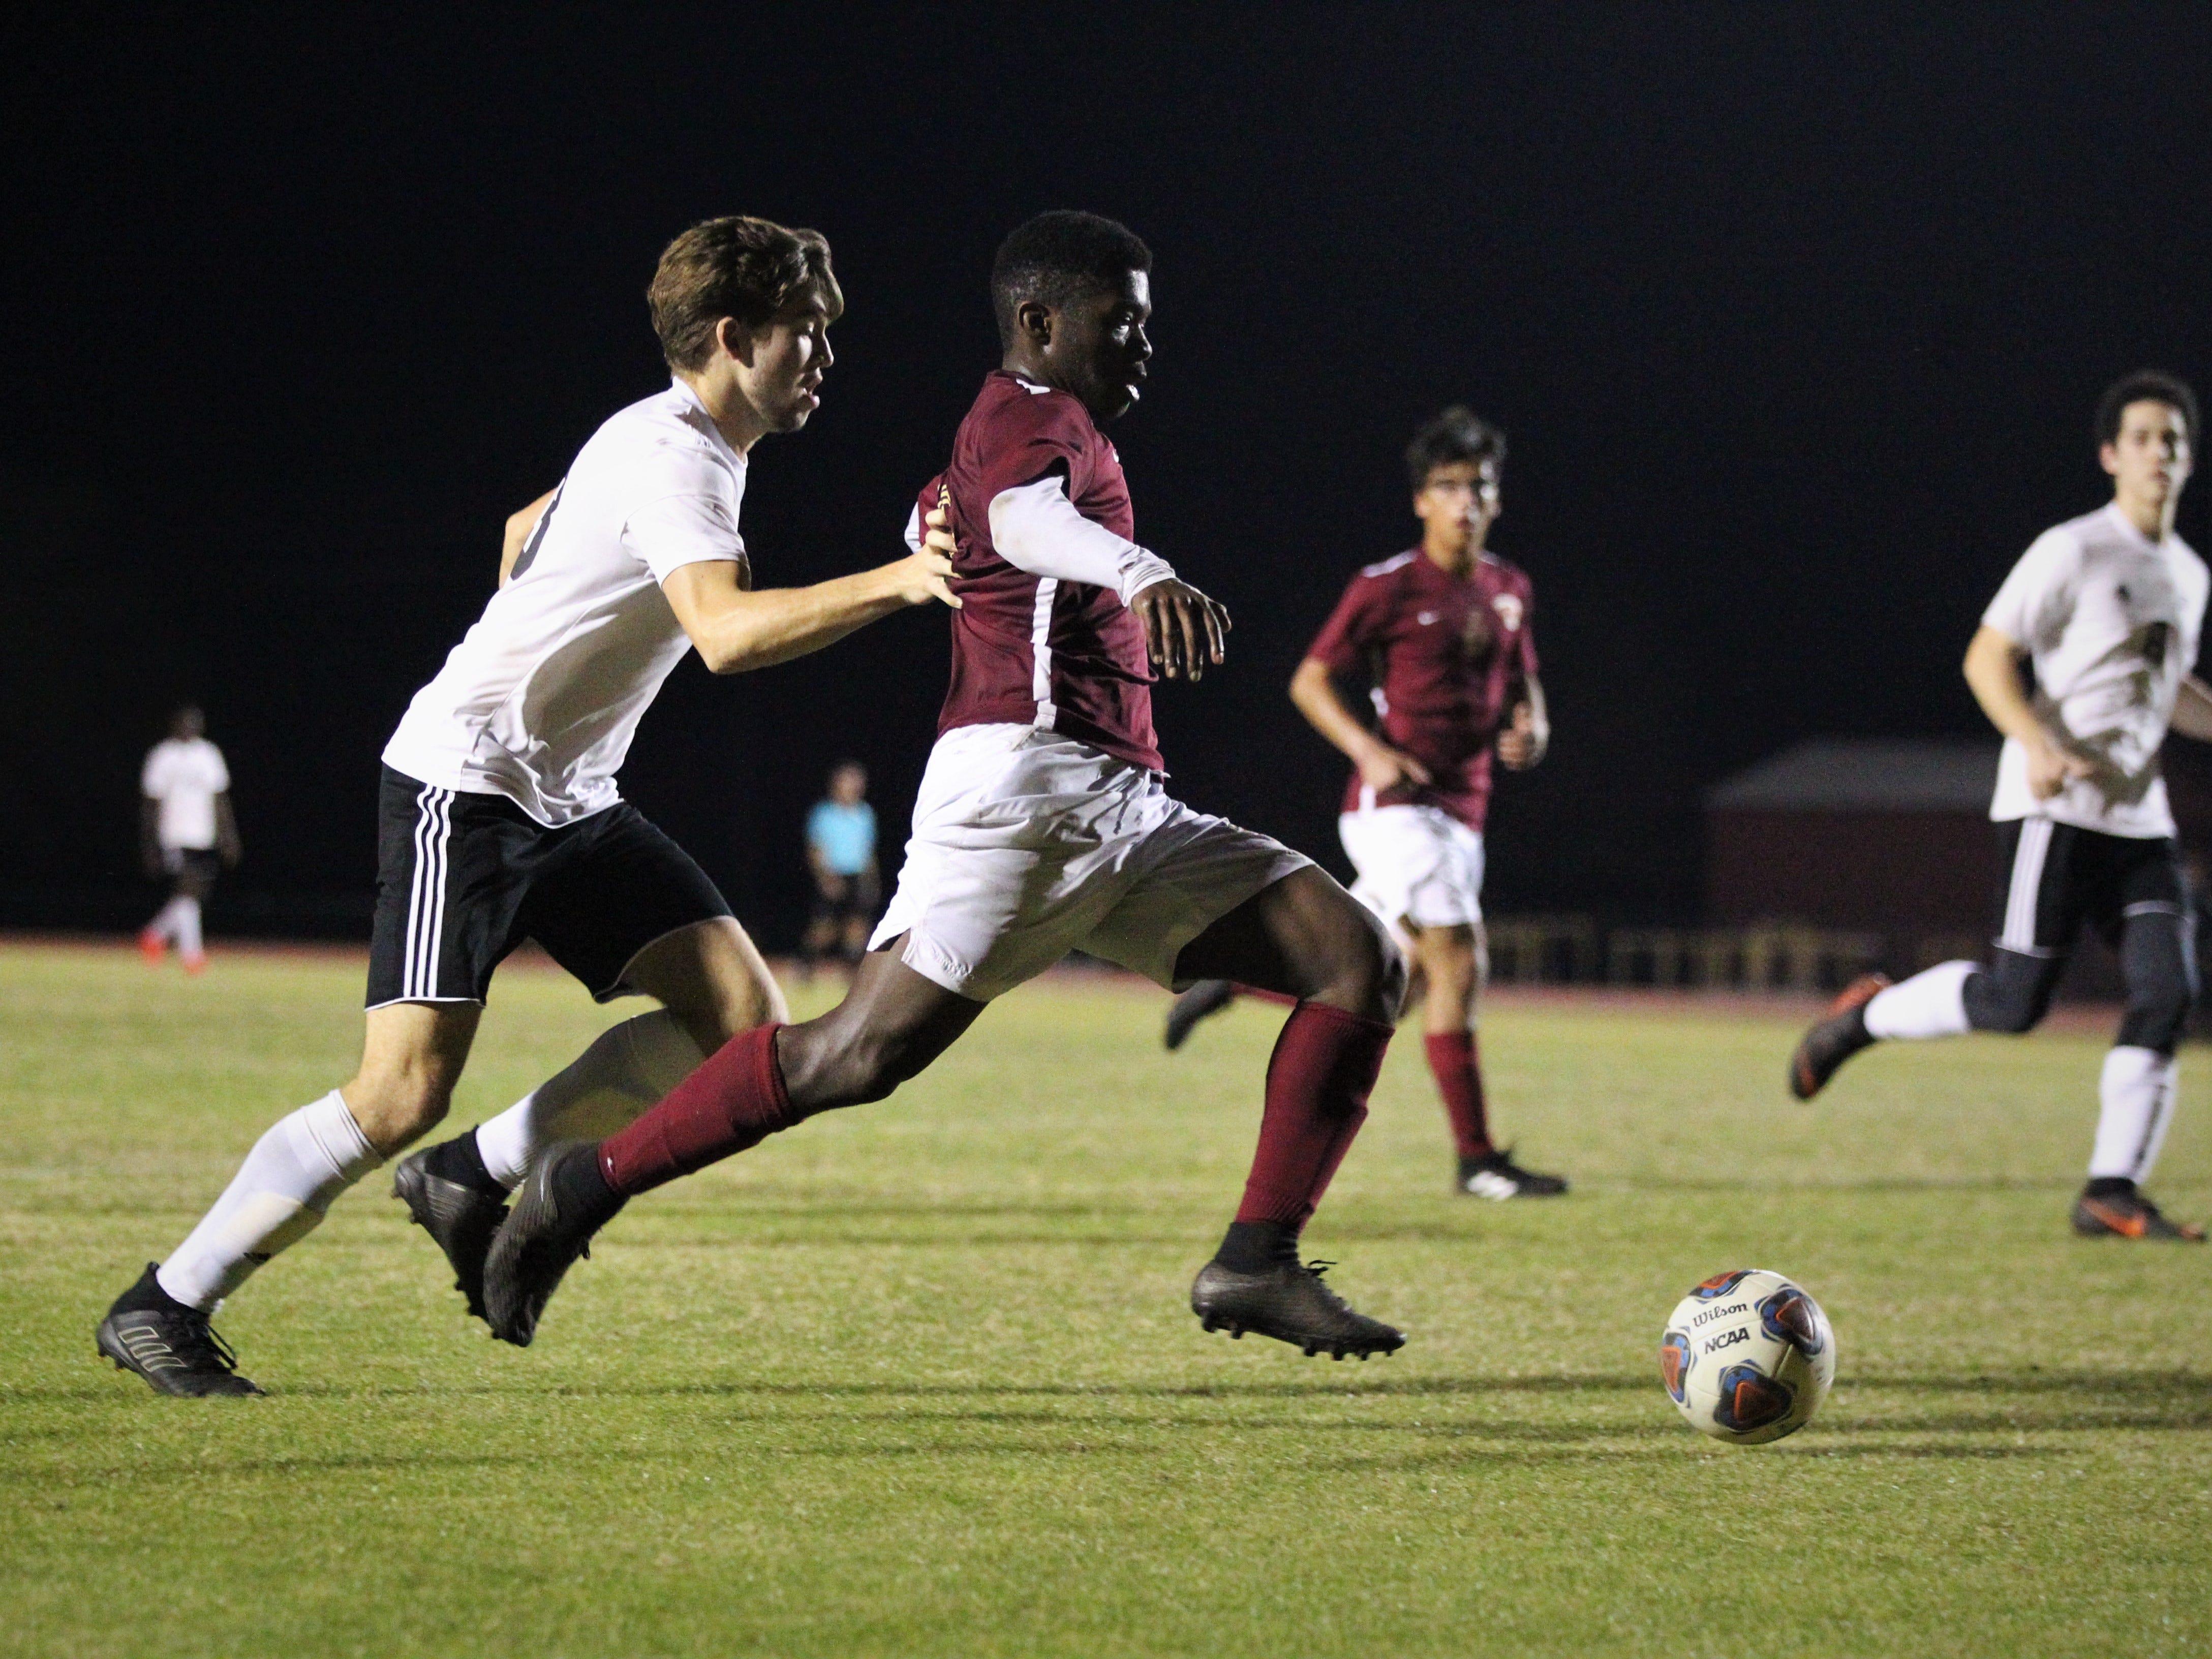 Florida High's Delali Simpson dribbles in the box as Florida High's boys soccer team beat South Walton 2-0 during a Region 1-2A quarterfinal on Feb. 6, 2018.